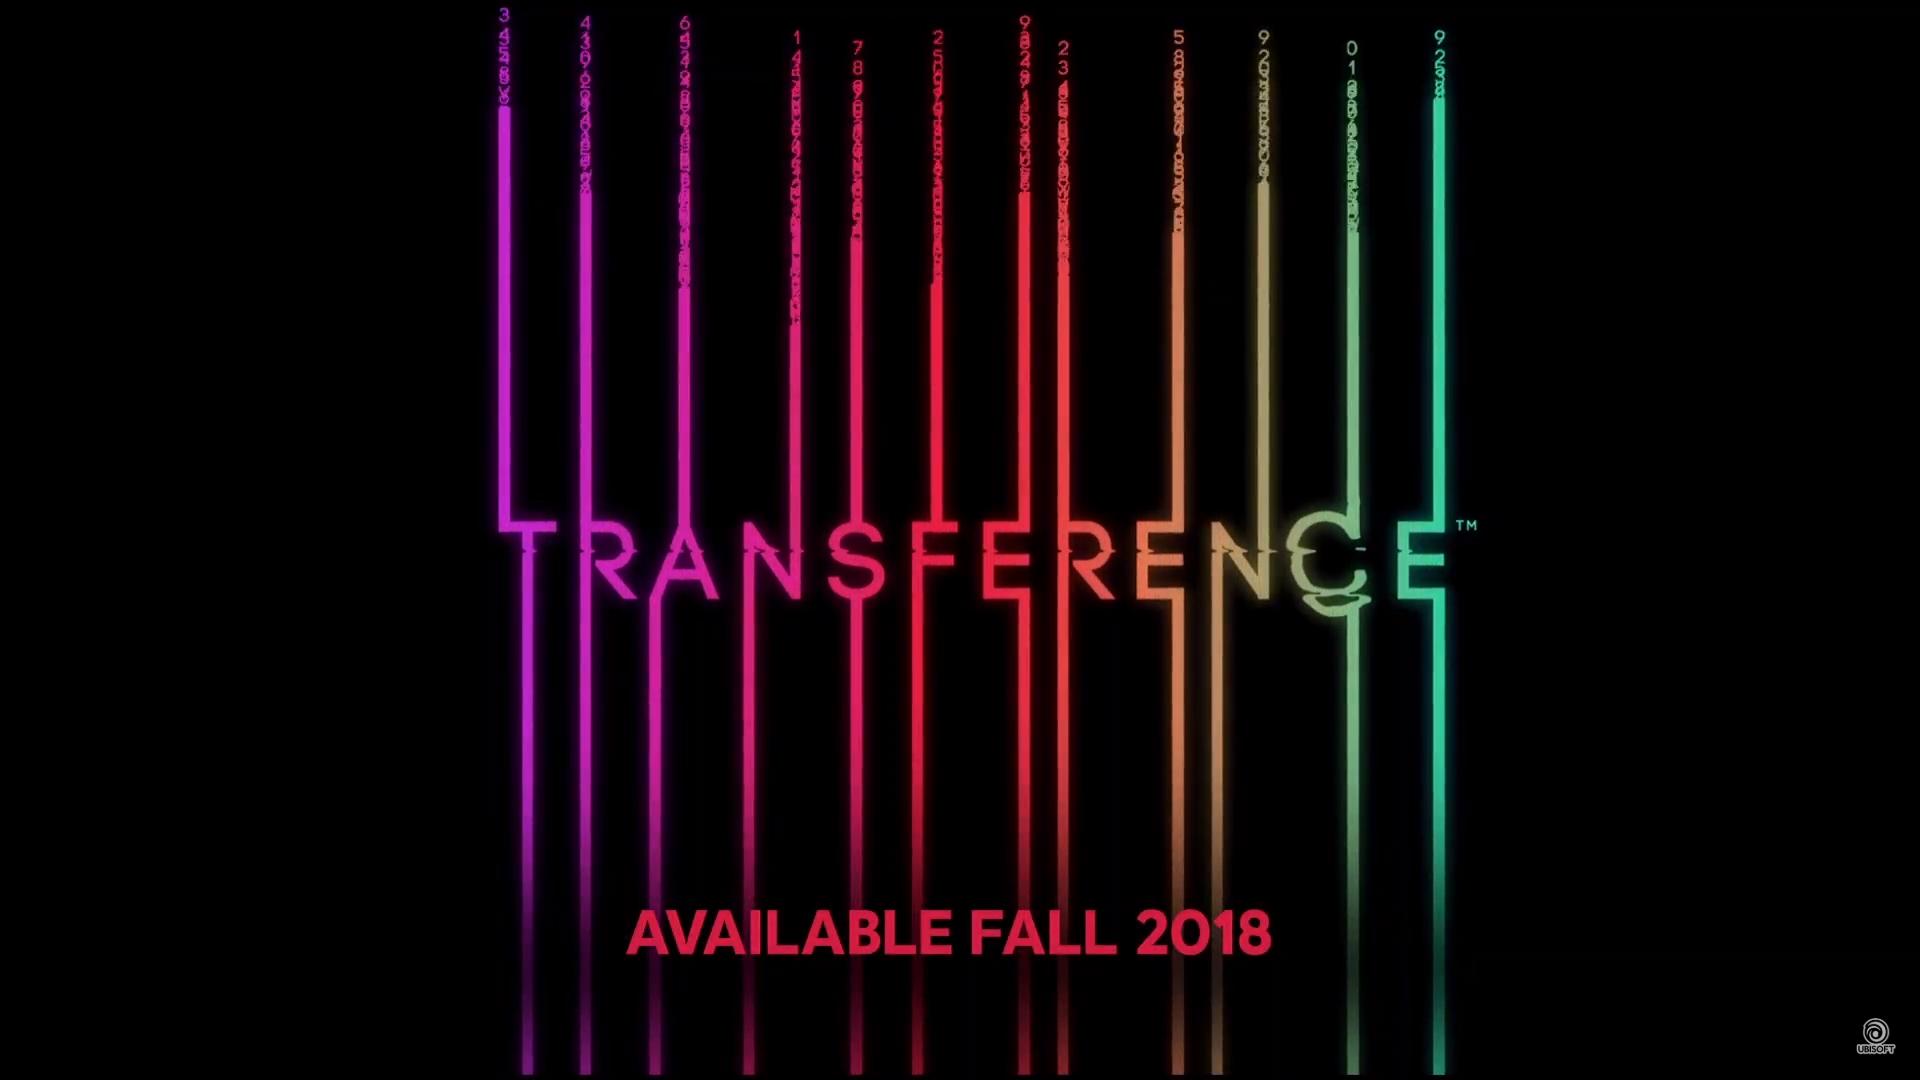 Анонс необычногохоррора Transference отUbisoft